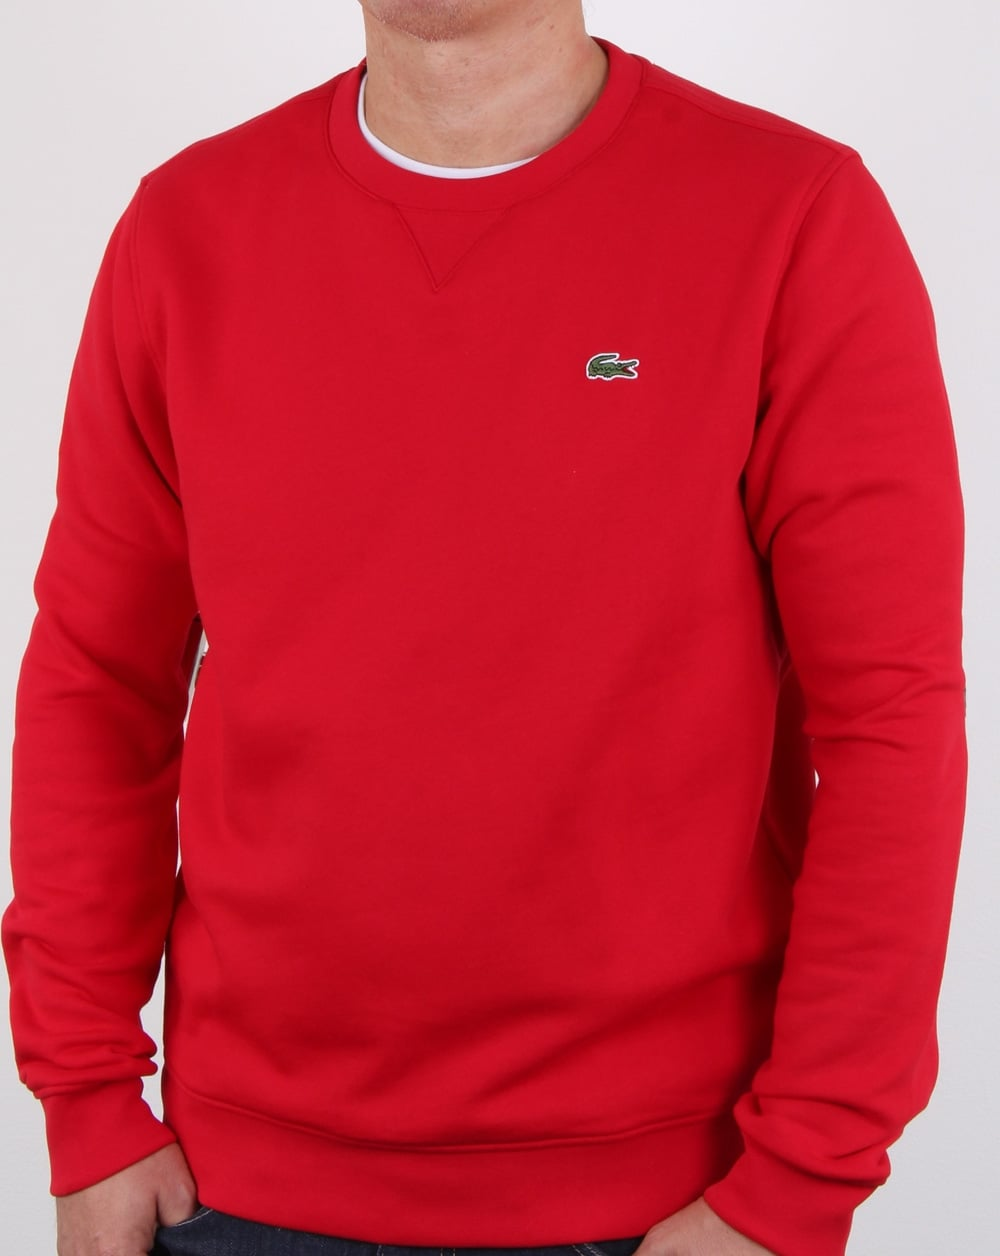 bc51766076db59 mens lacoste jumper sale   OFF78% Discounts